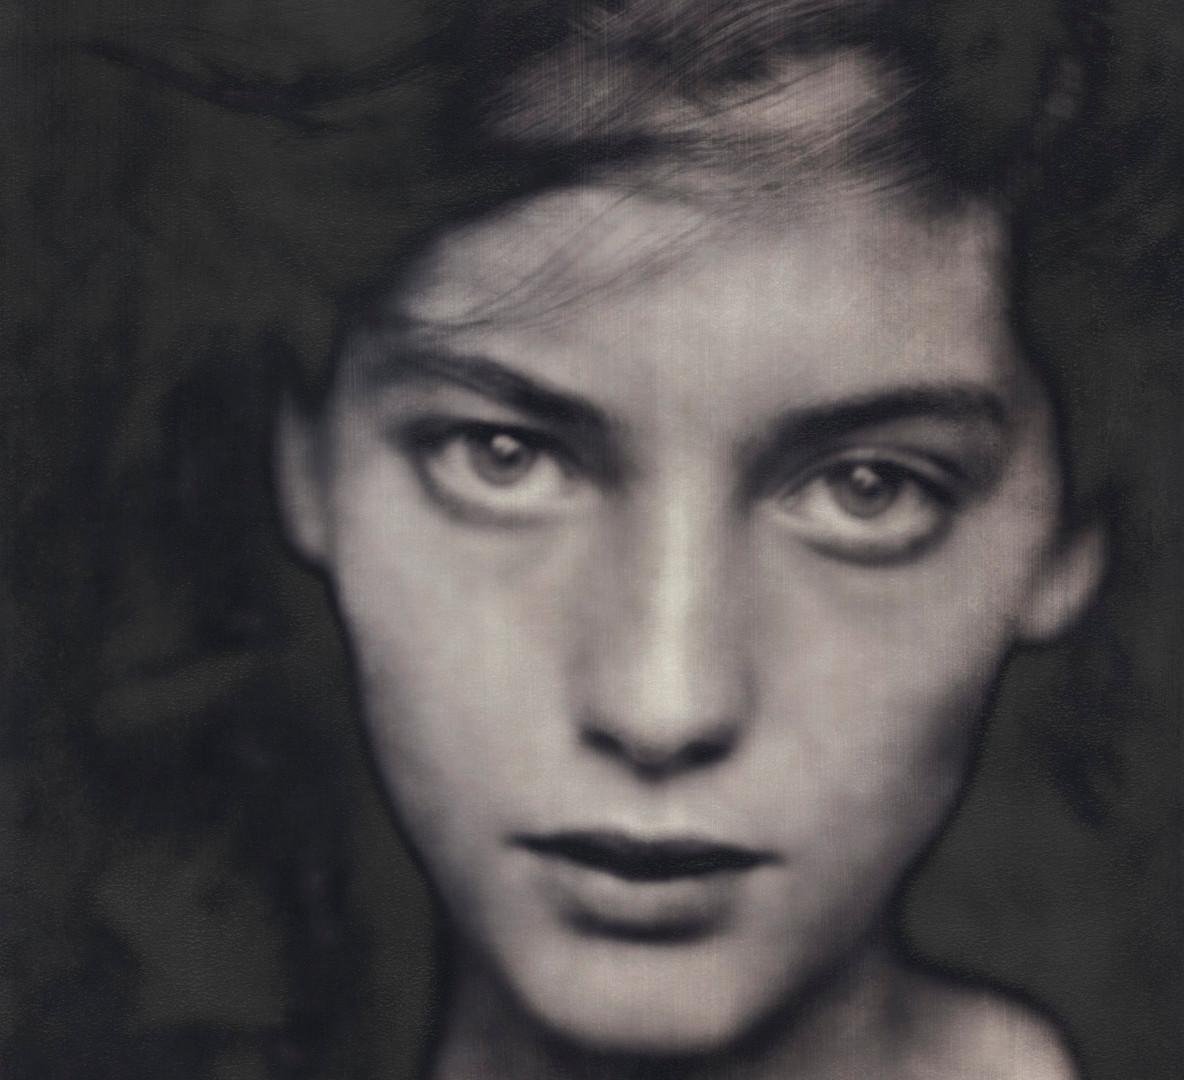 Paolo Roversi, Lucie, Paris, 1990